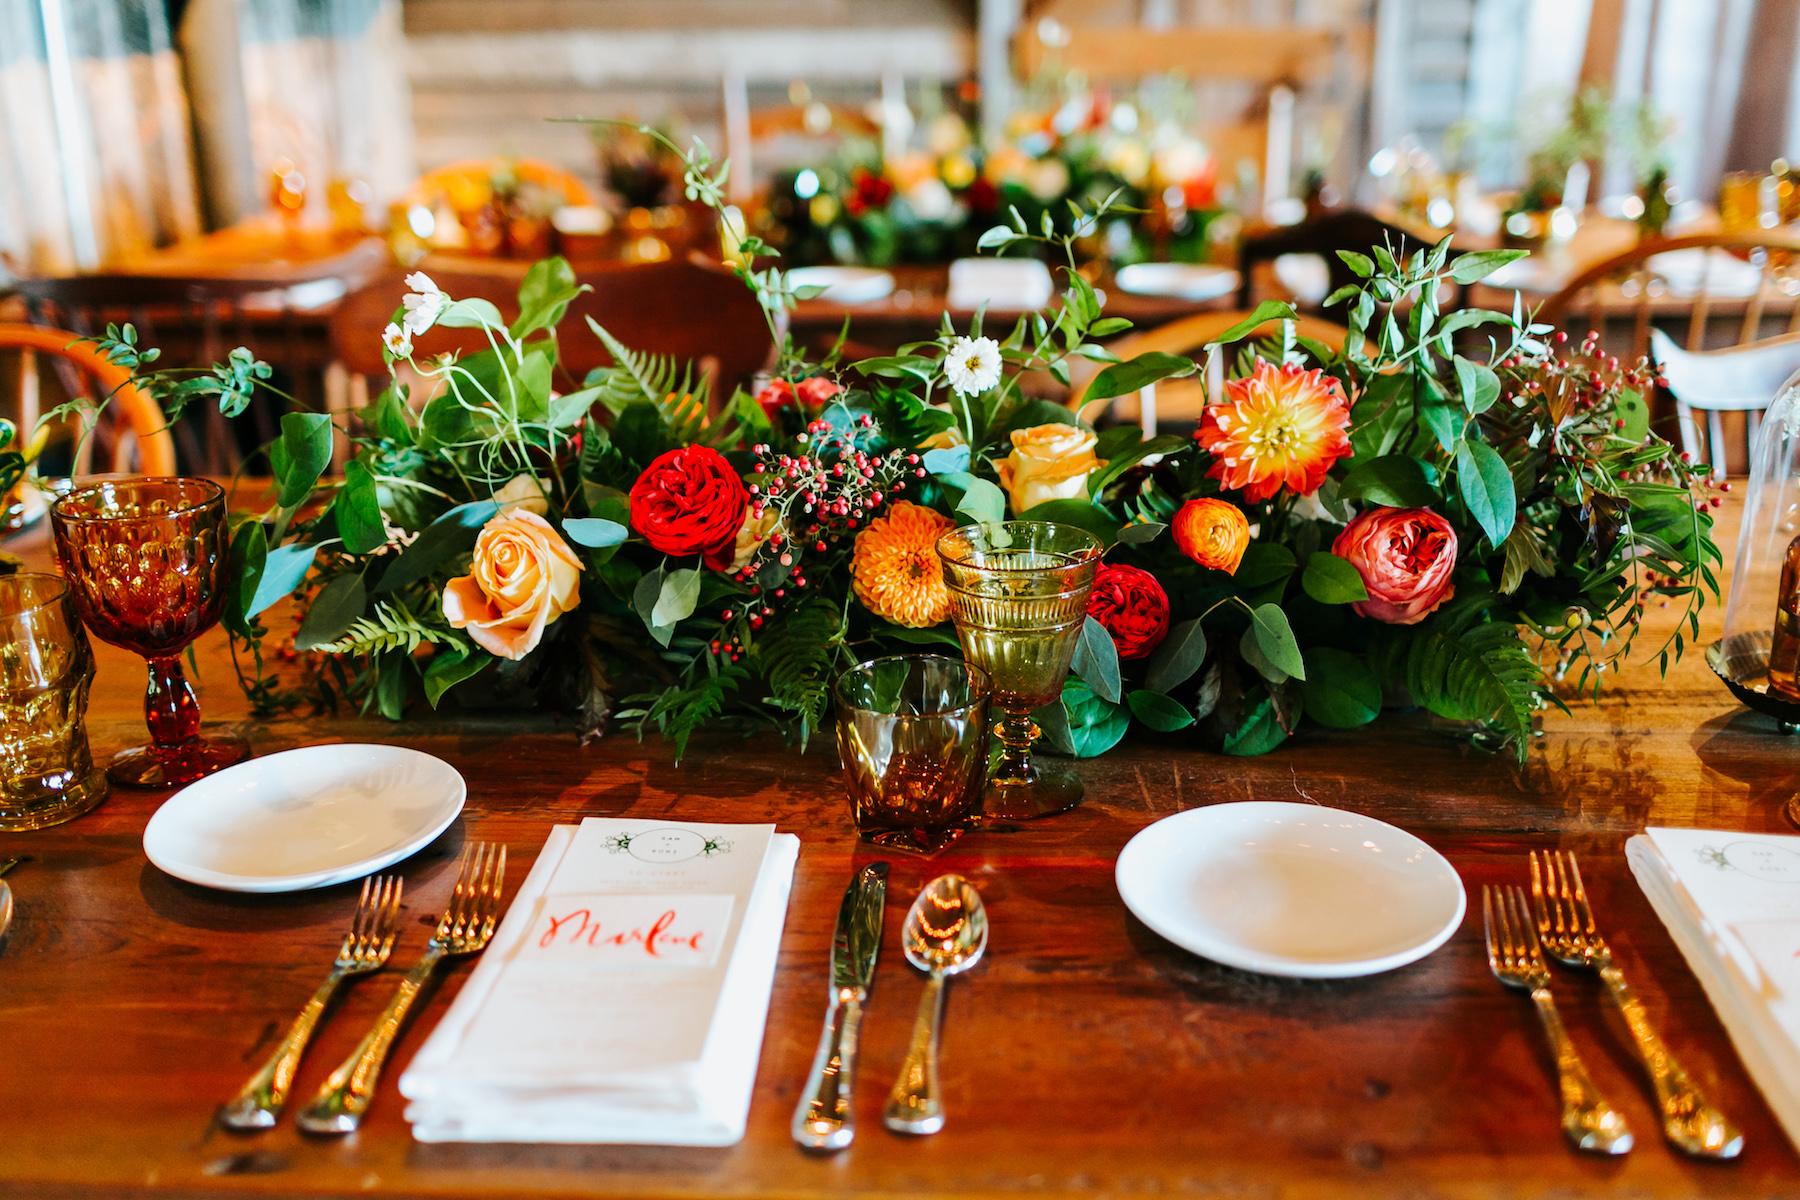 terrain+at+styers+gay+wedding+florist+colly+flowers7.jpg